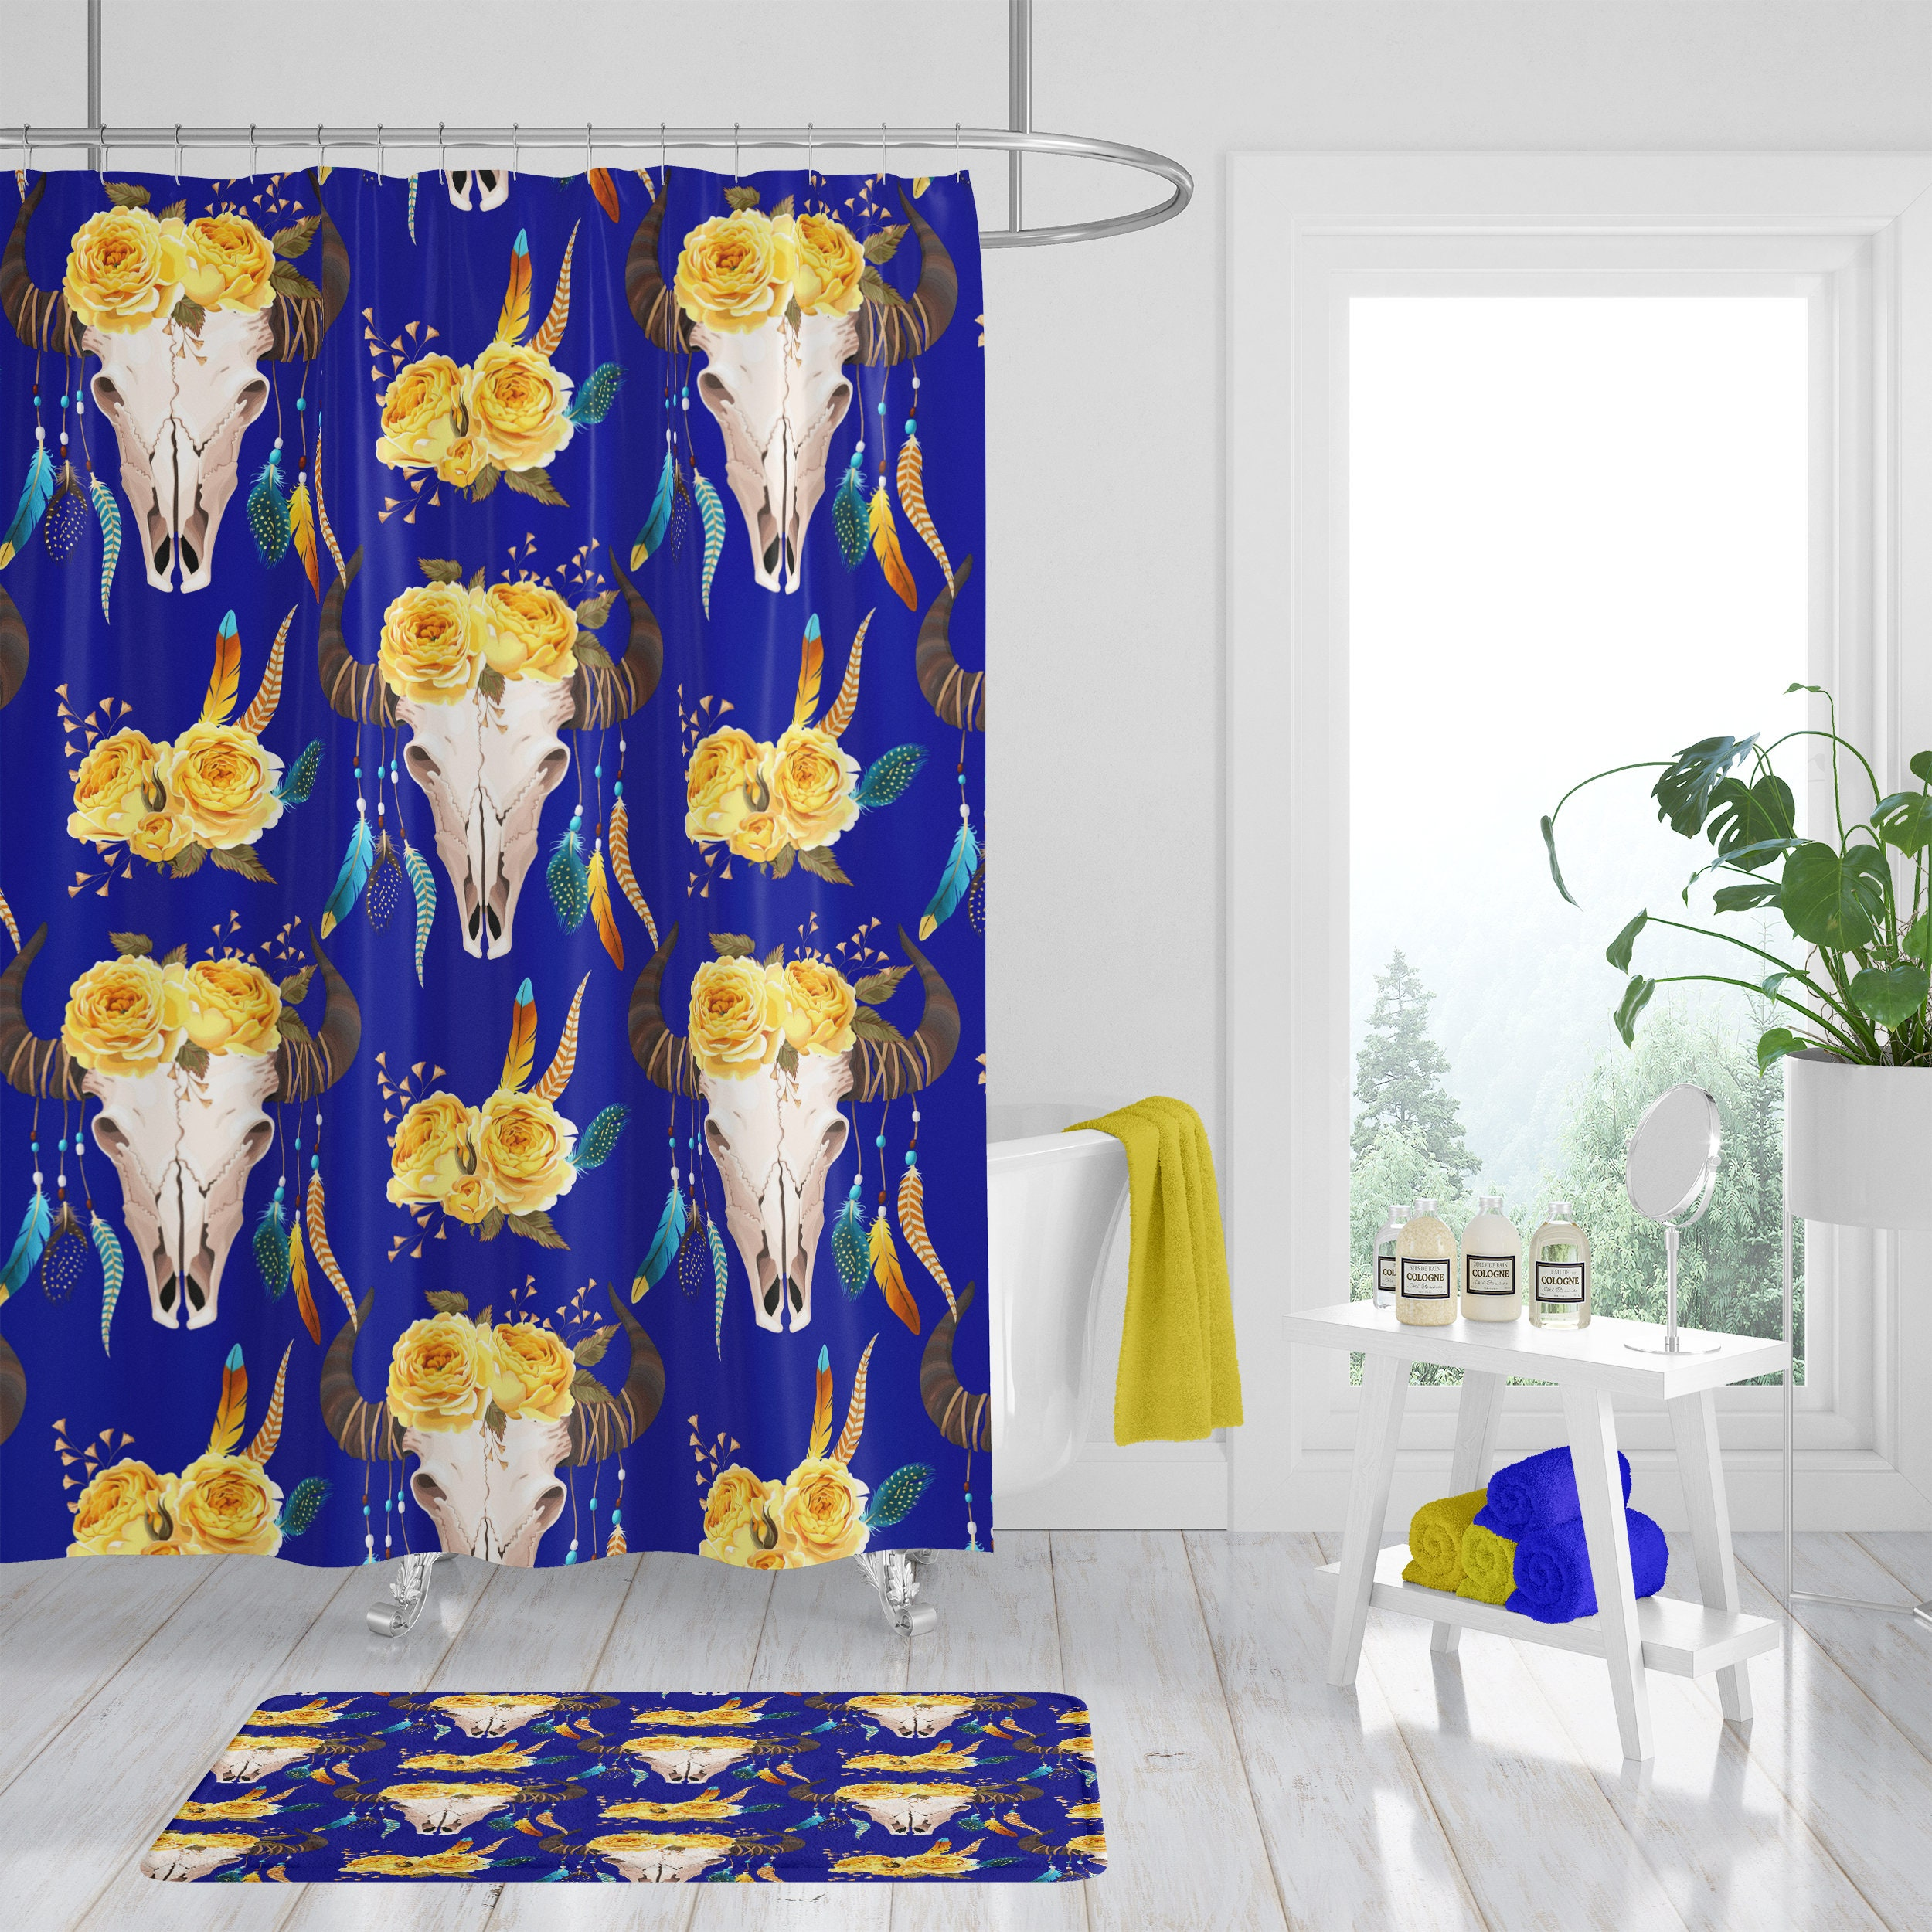 Shower Curtain Boho Decor Curtains Bath Mat Towels Bull Skull Floral Cobalt Blue Yellow